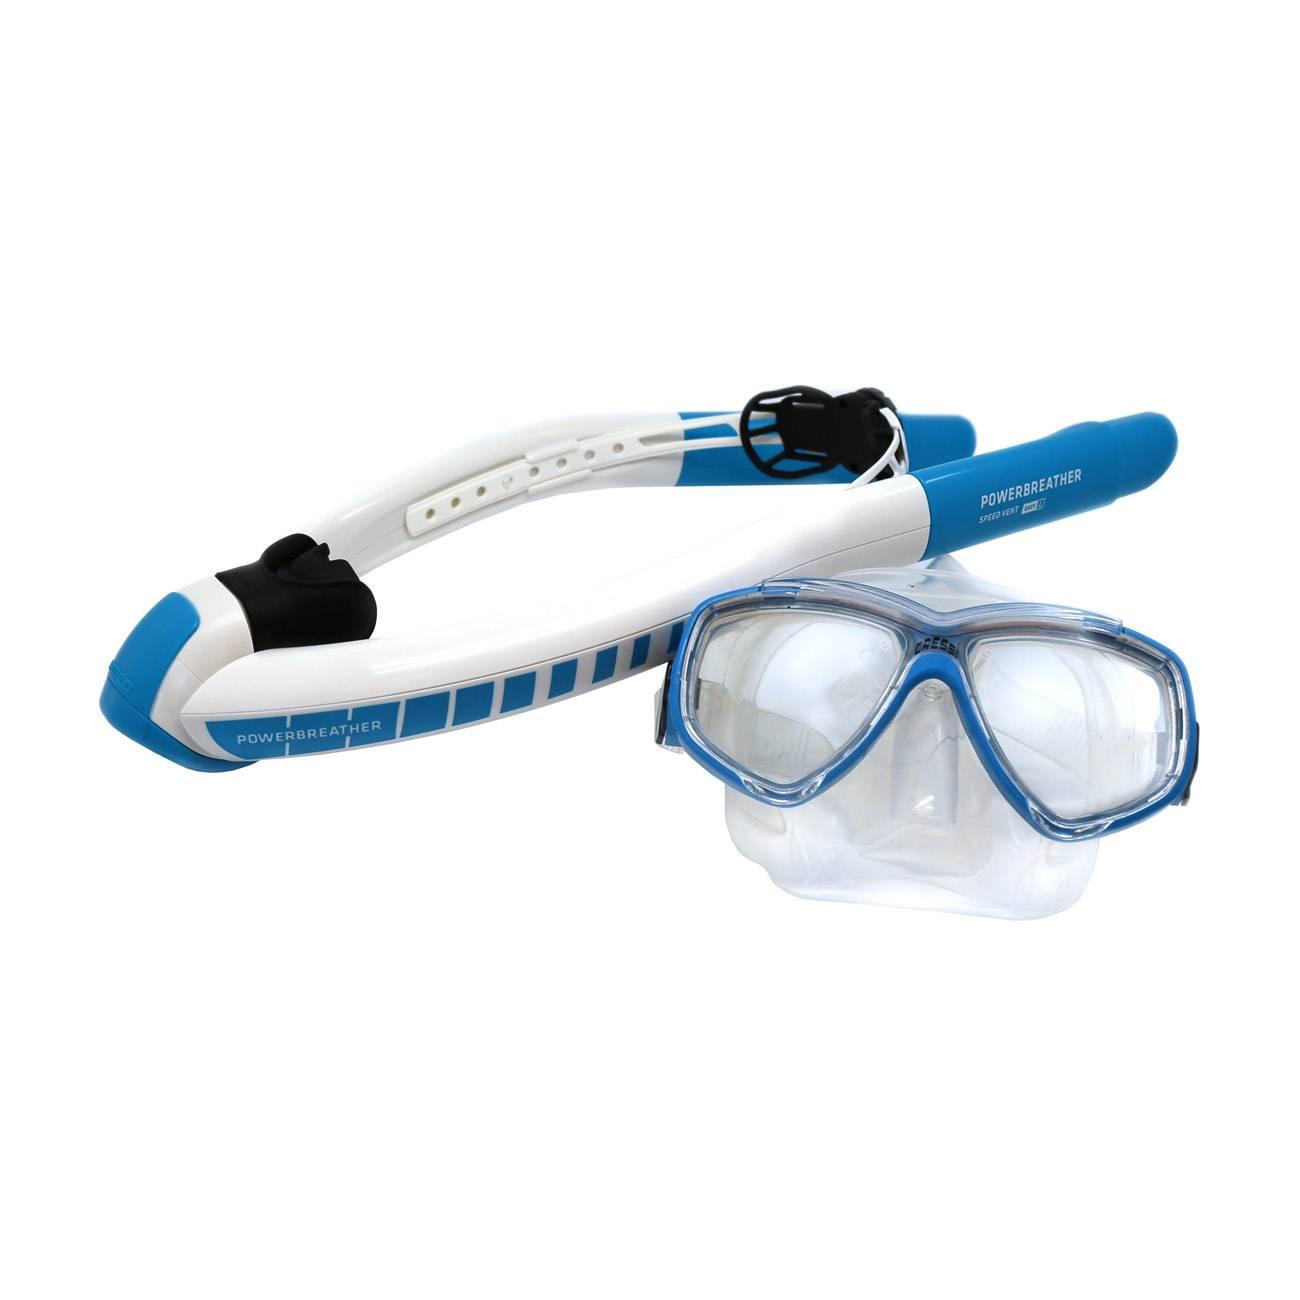 Powerbreather Beach Snorkel Set imagine